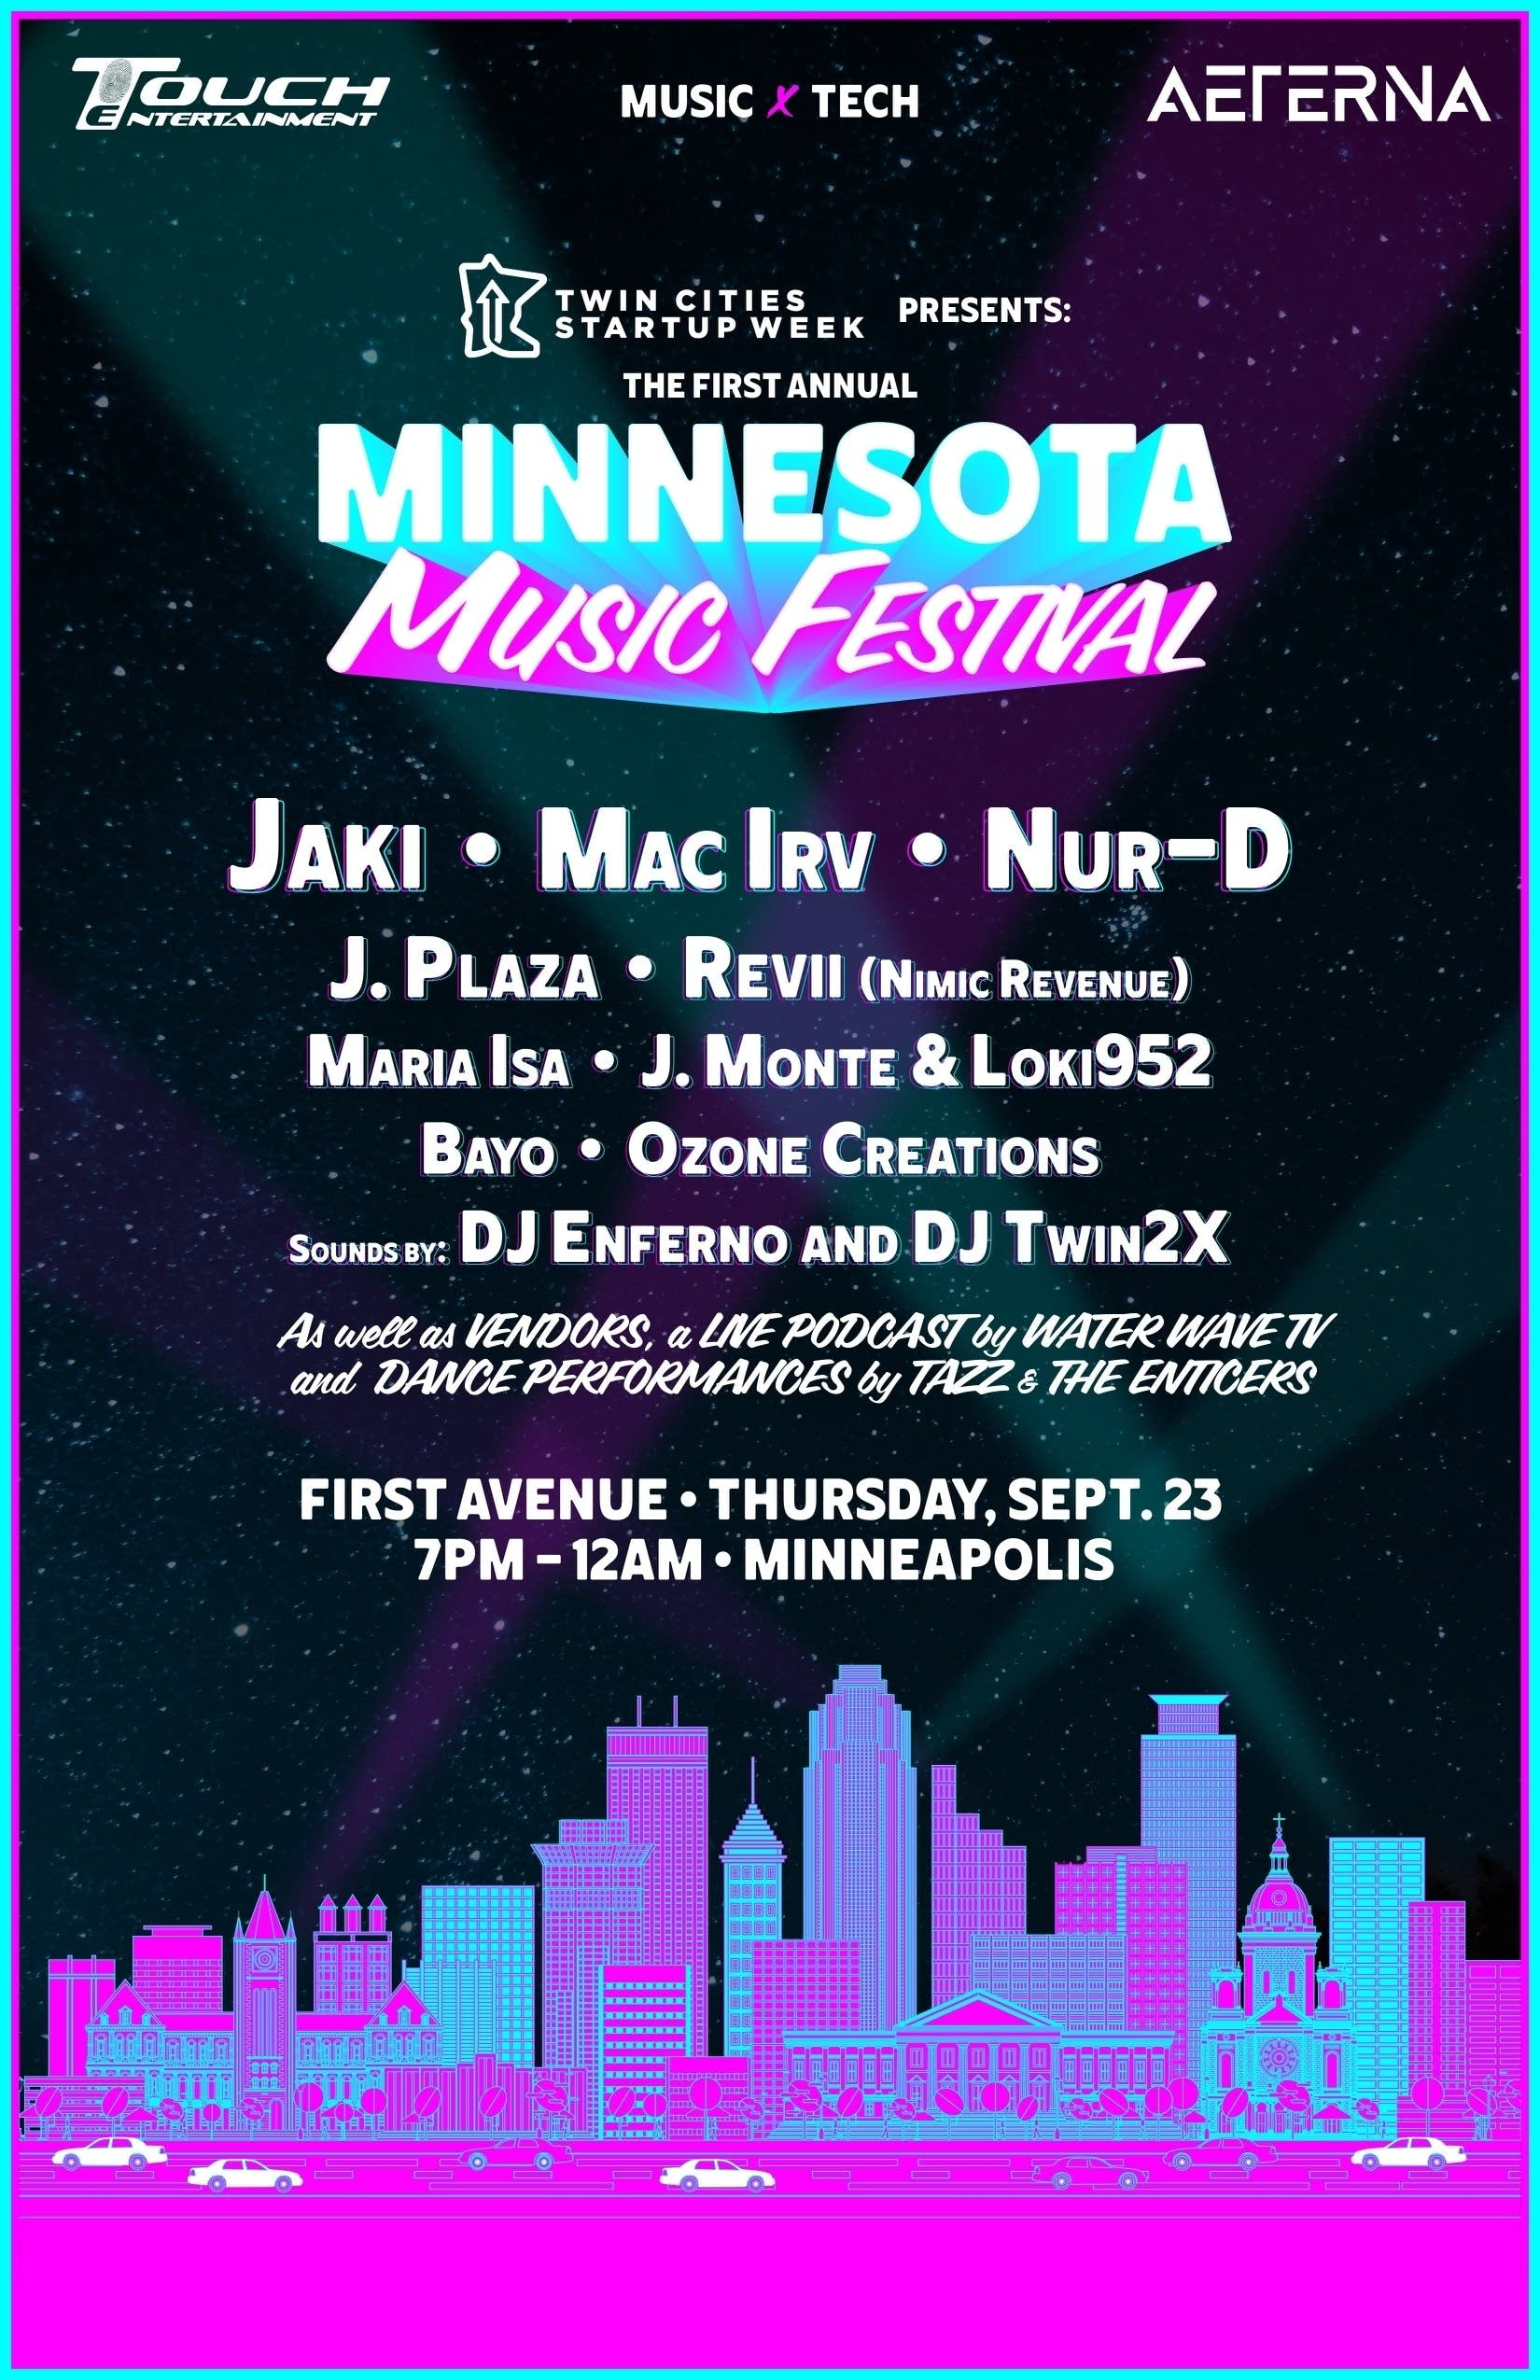 Minnesota Music Festival - startup week